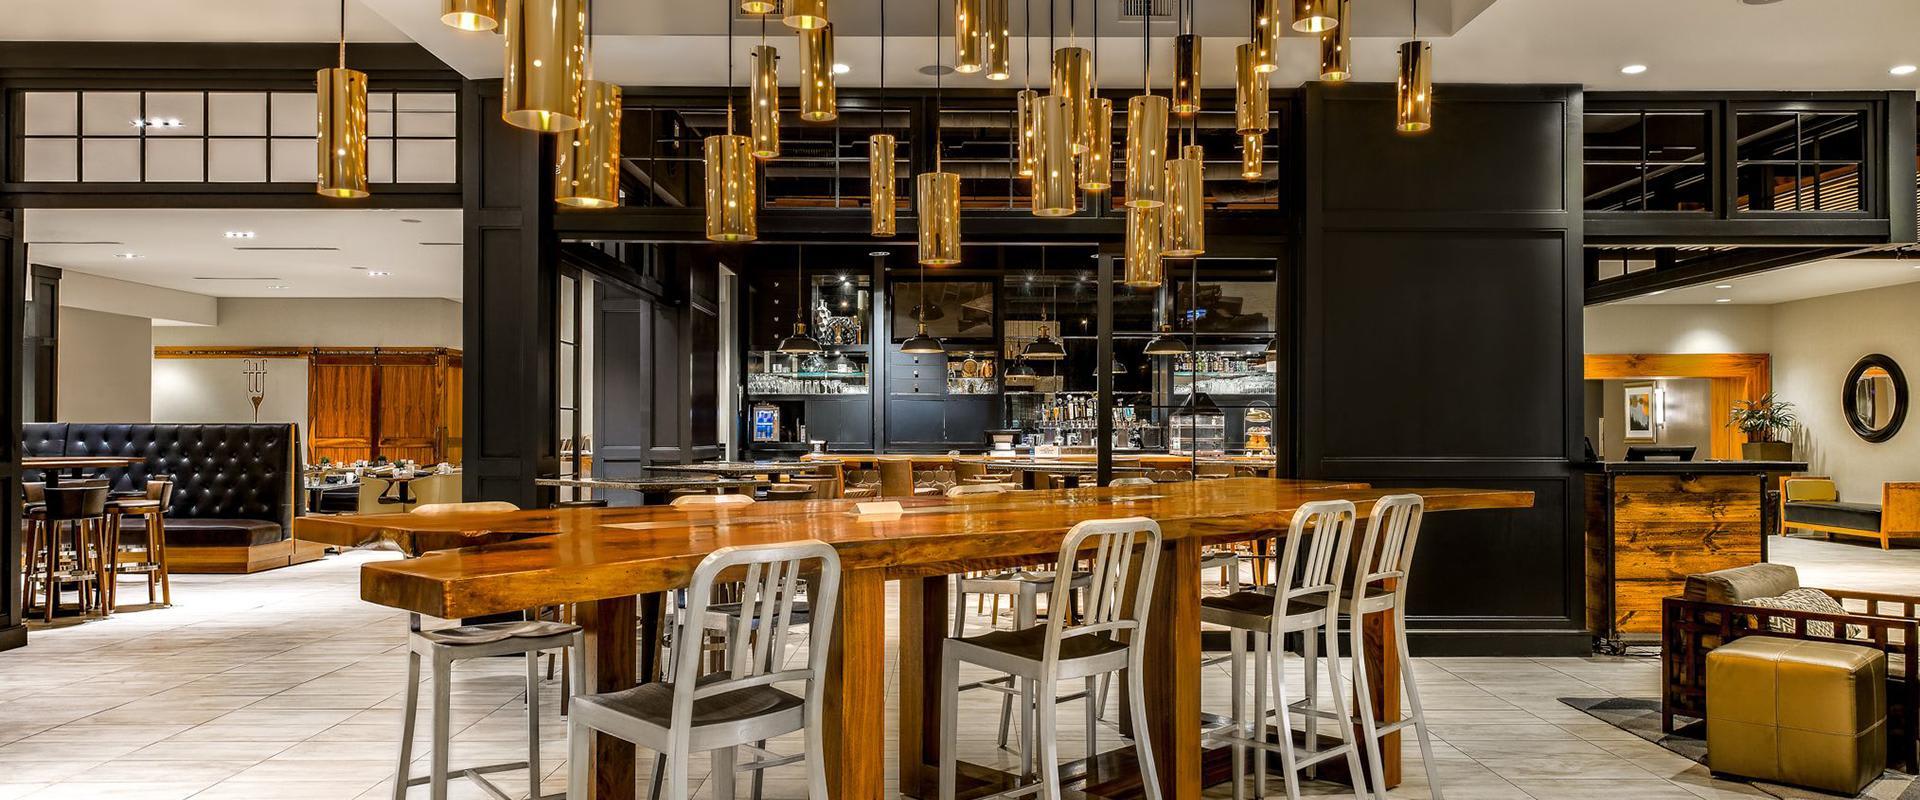 Charlotte North Carolina Hotel Restaurant and Bar